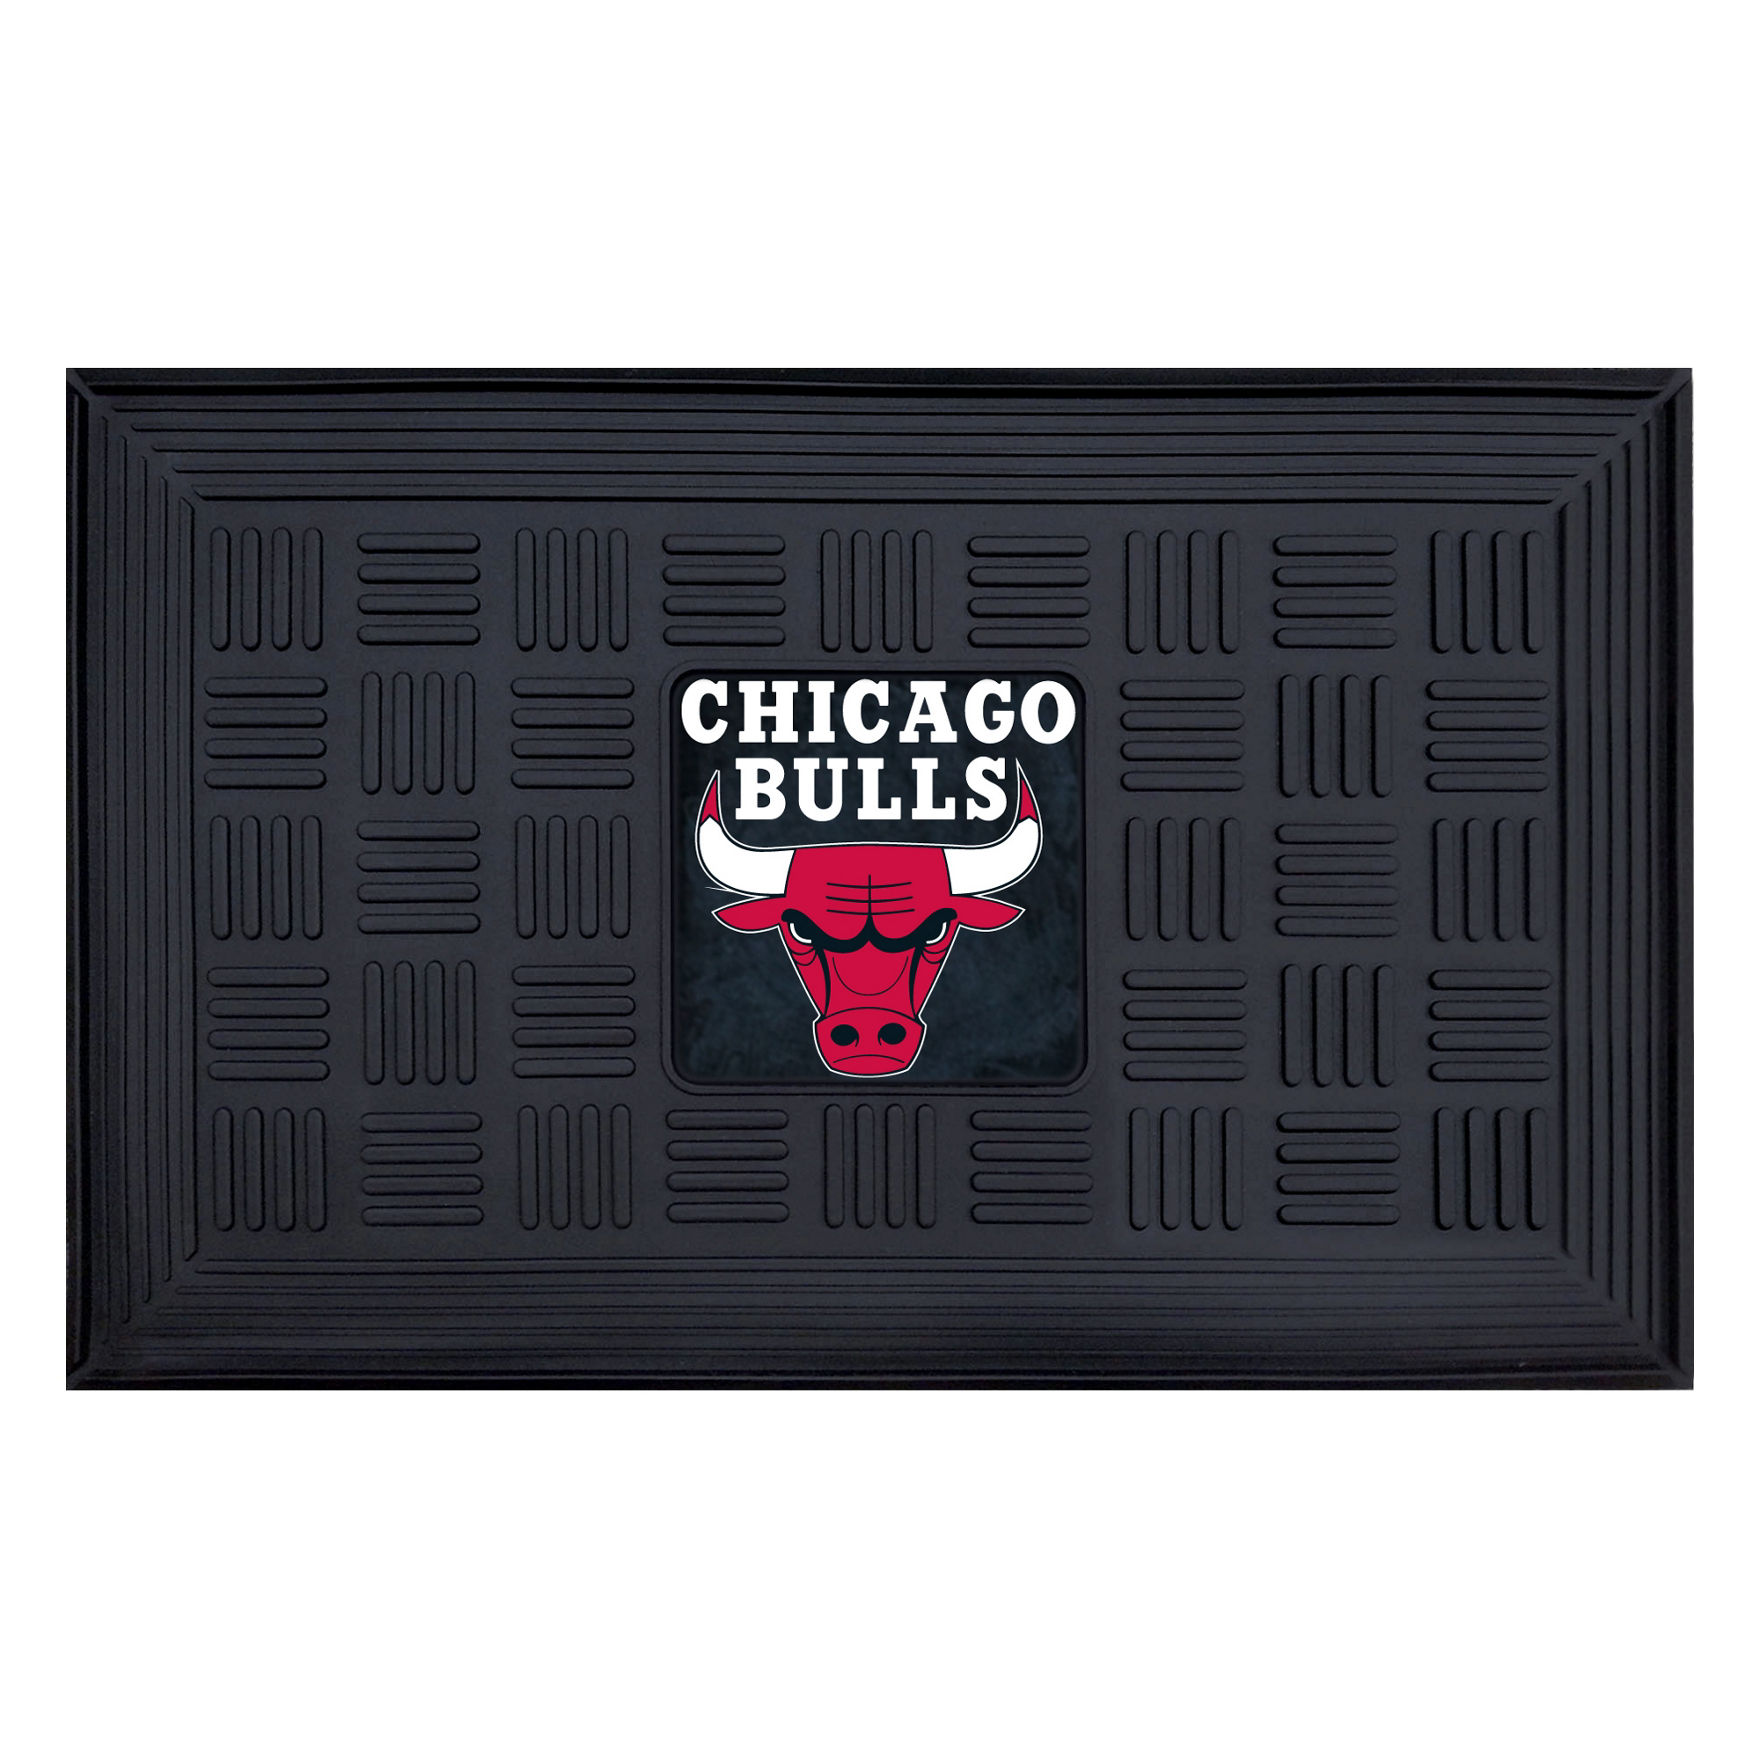 Fanmats Black Outdoor Rugs & Doormats NBA Outdoor Decor